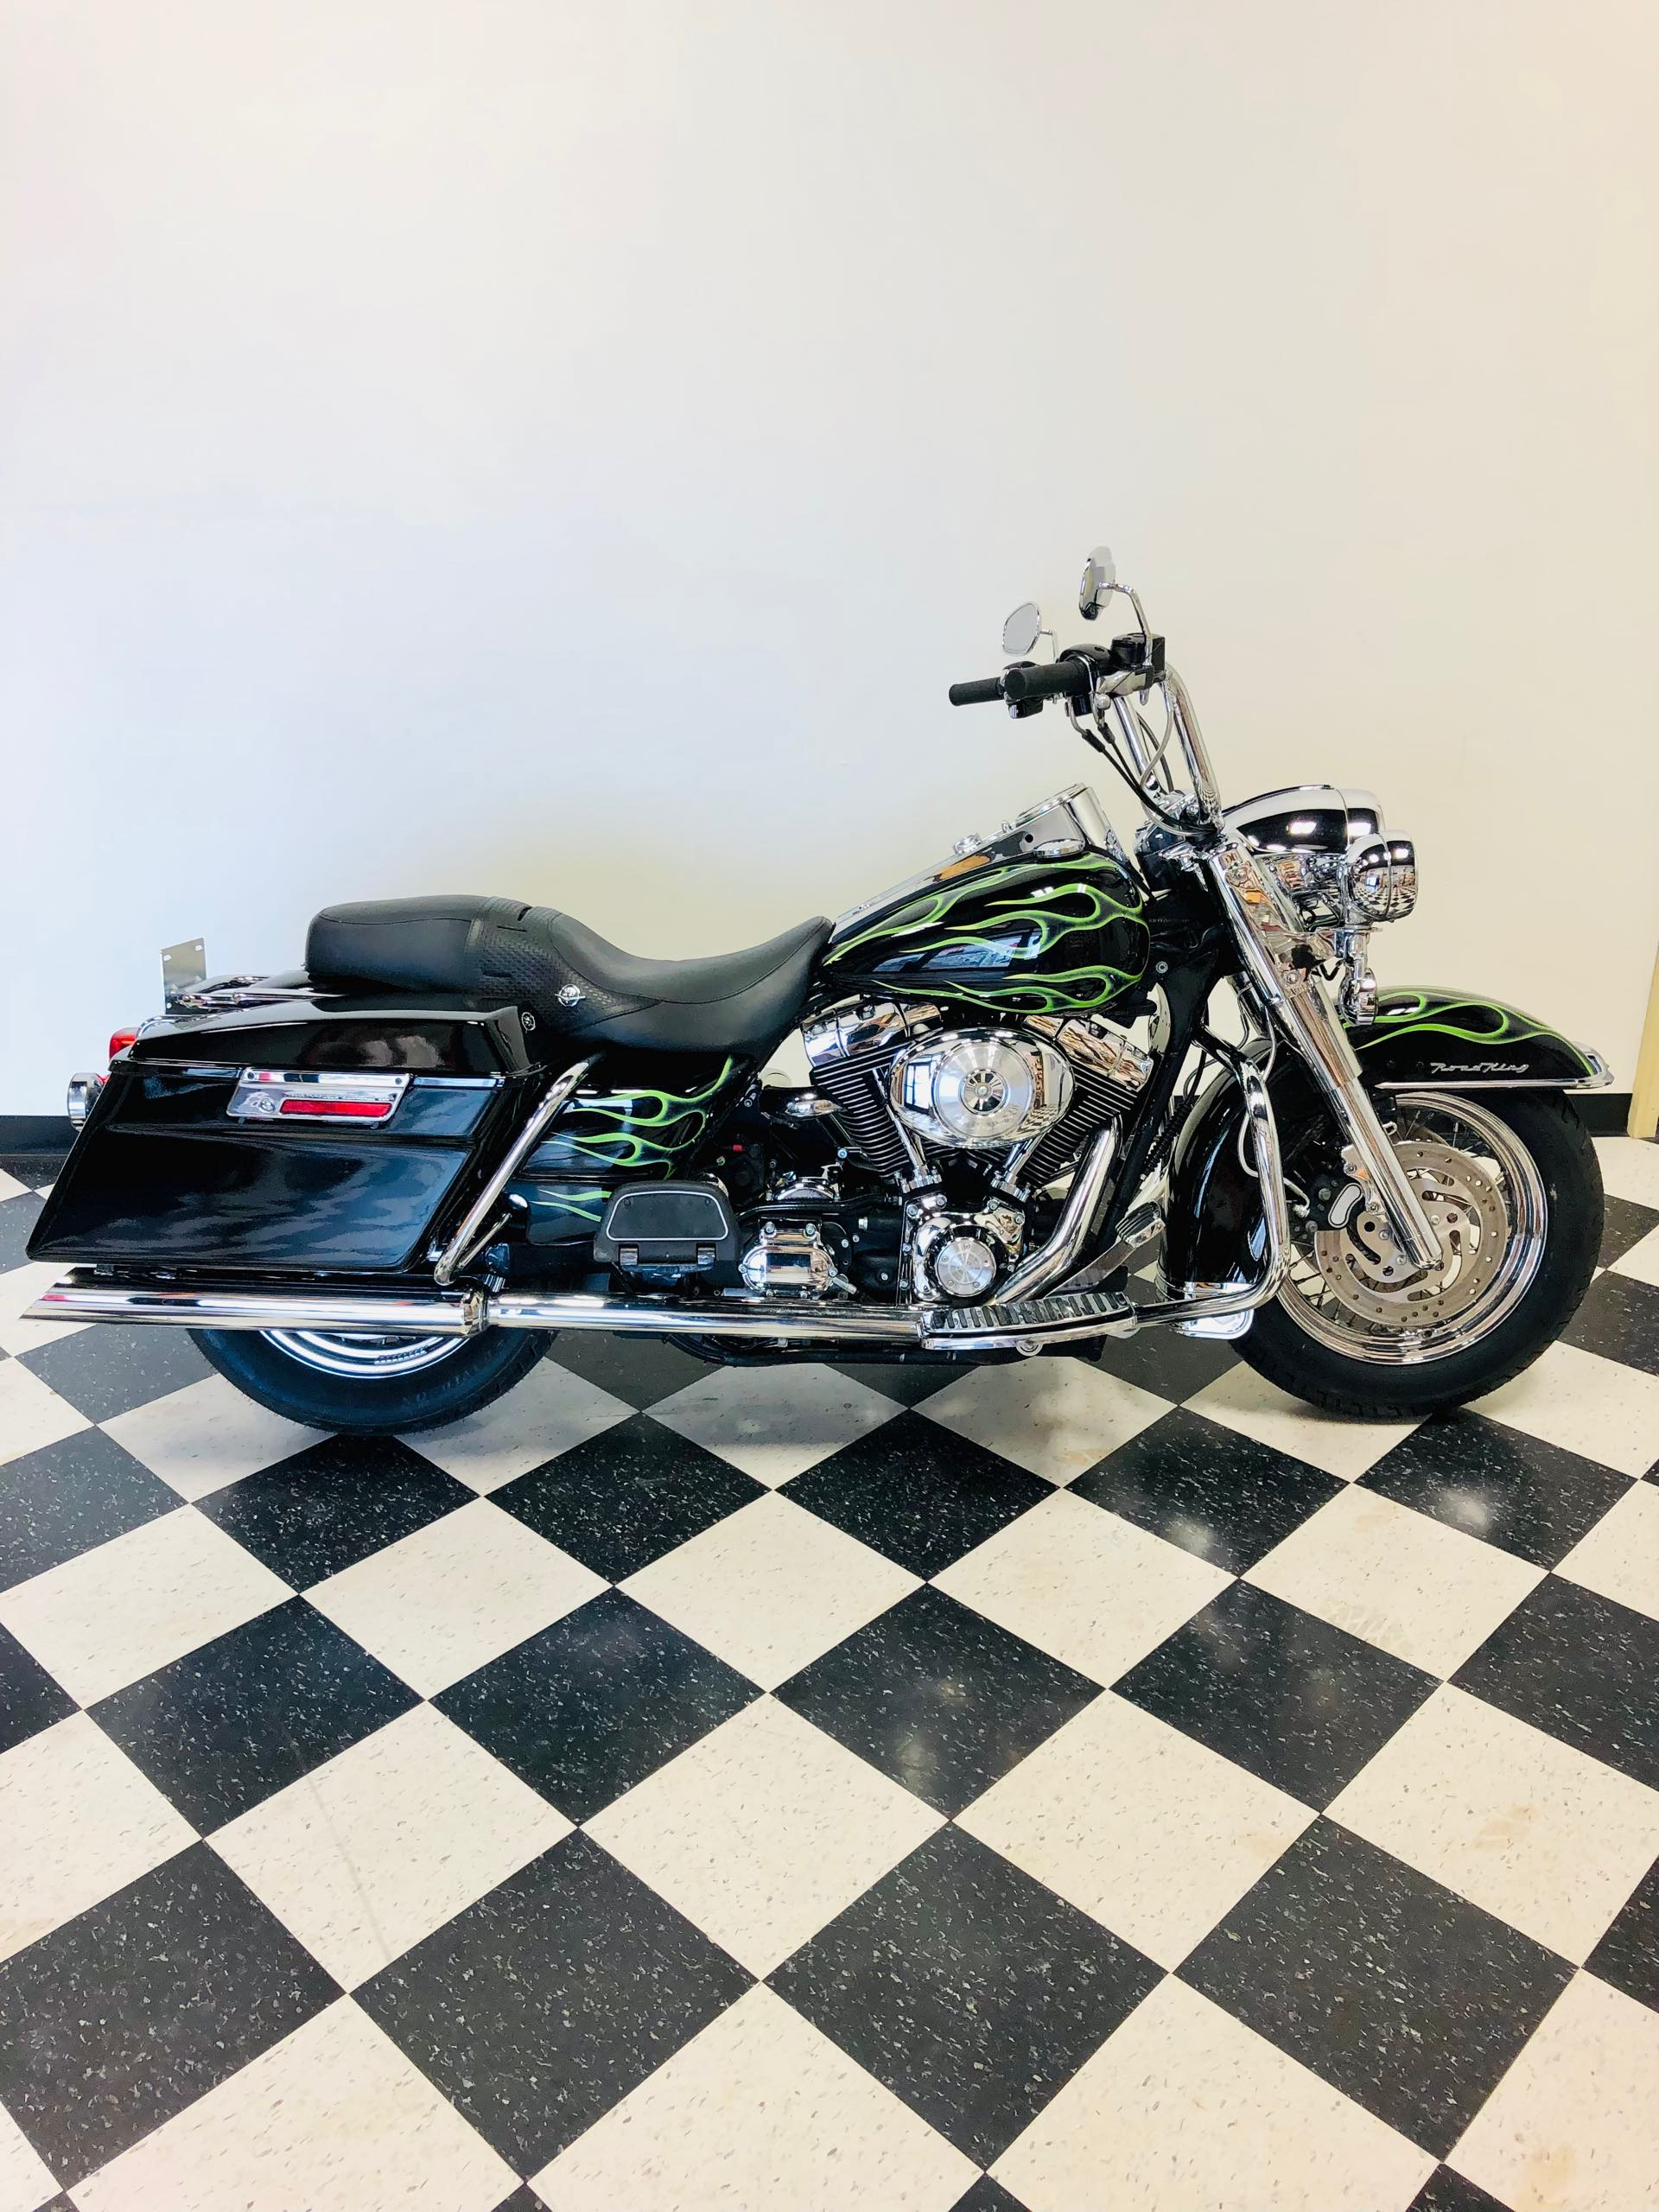 2004 Harley-Davidson Road King Classic at Deluxe Harley Davidson